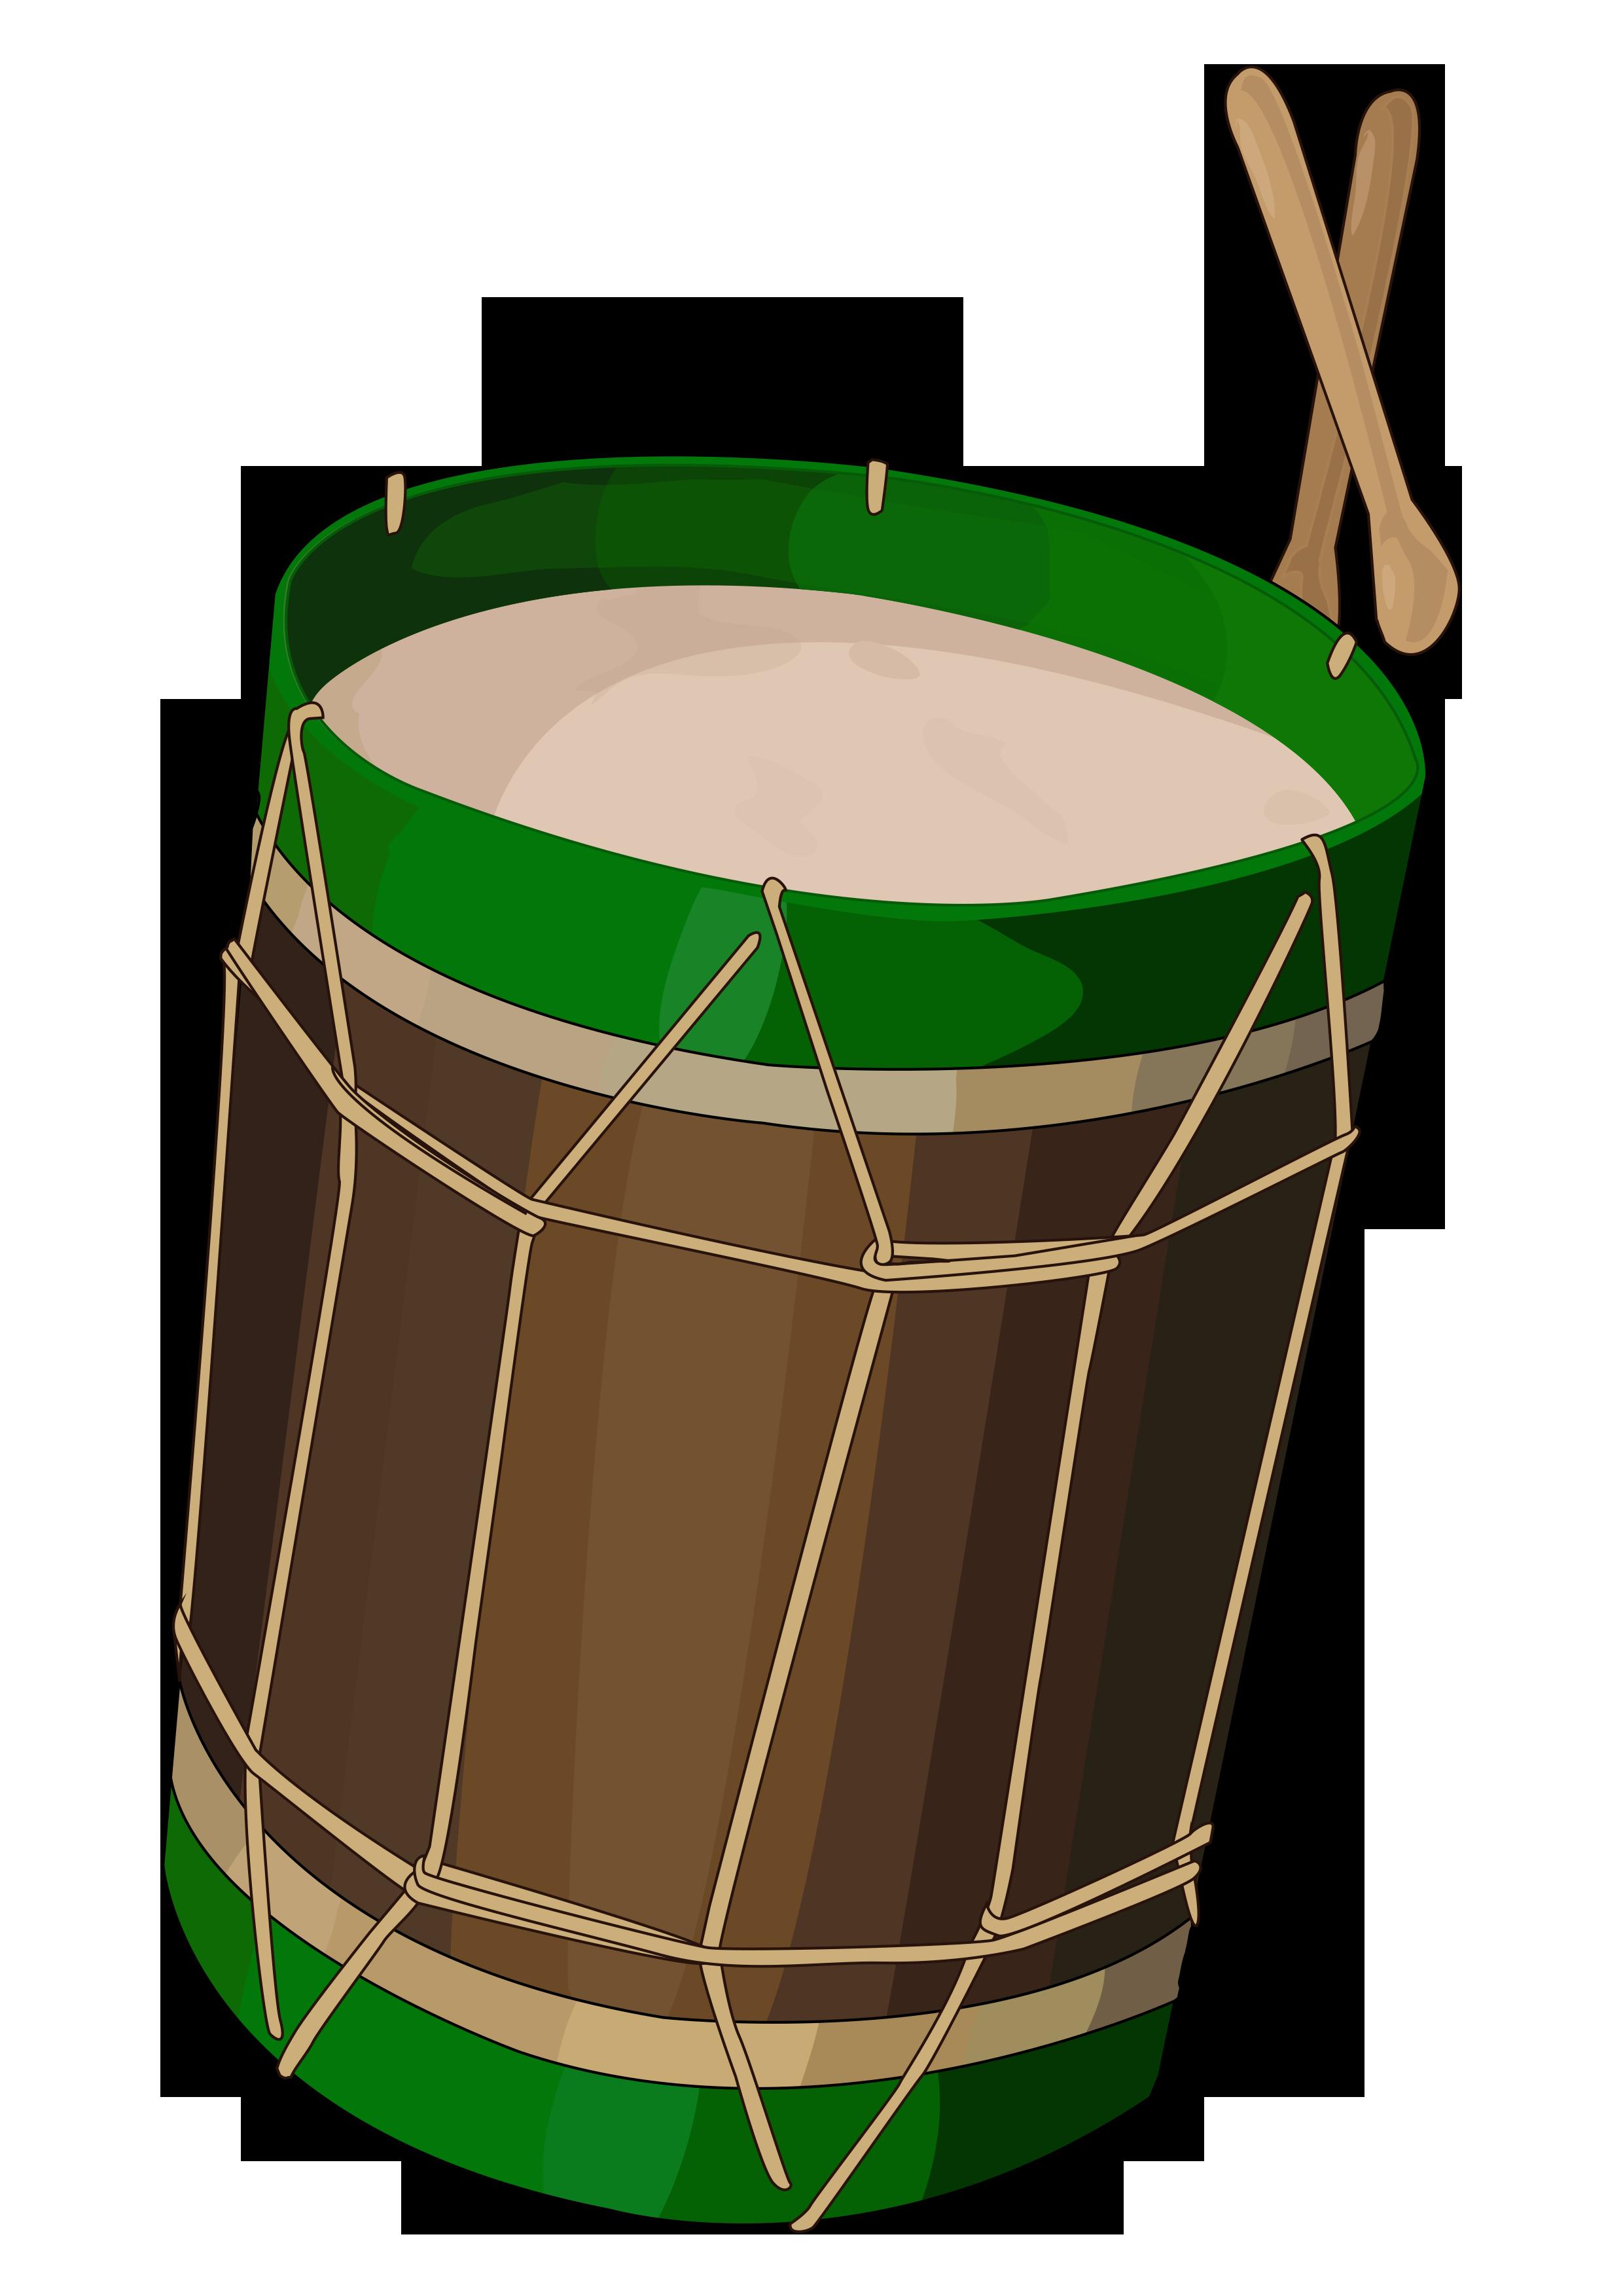 Del hierro canal rea. Drum clipart tambor